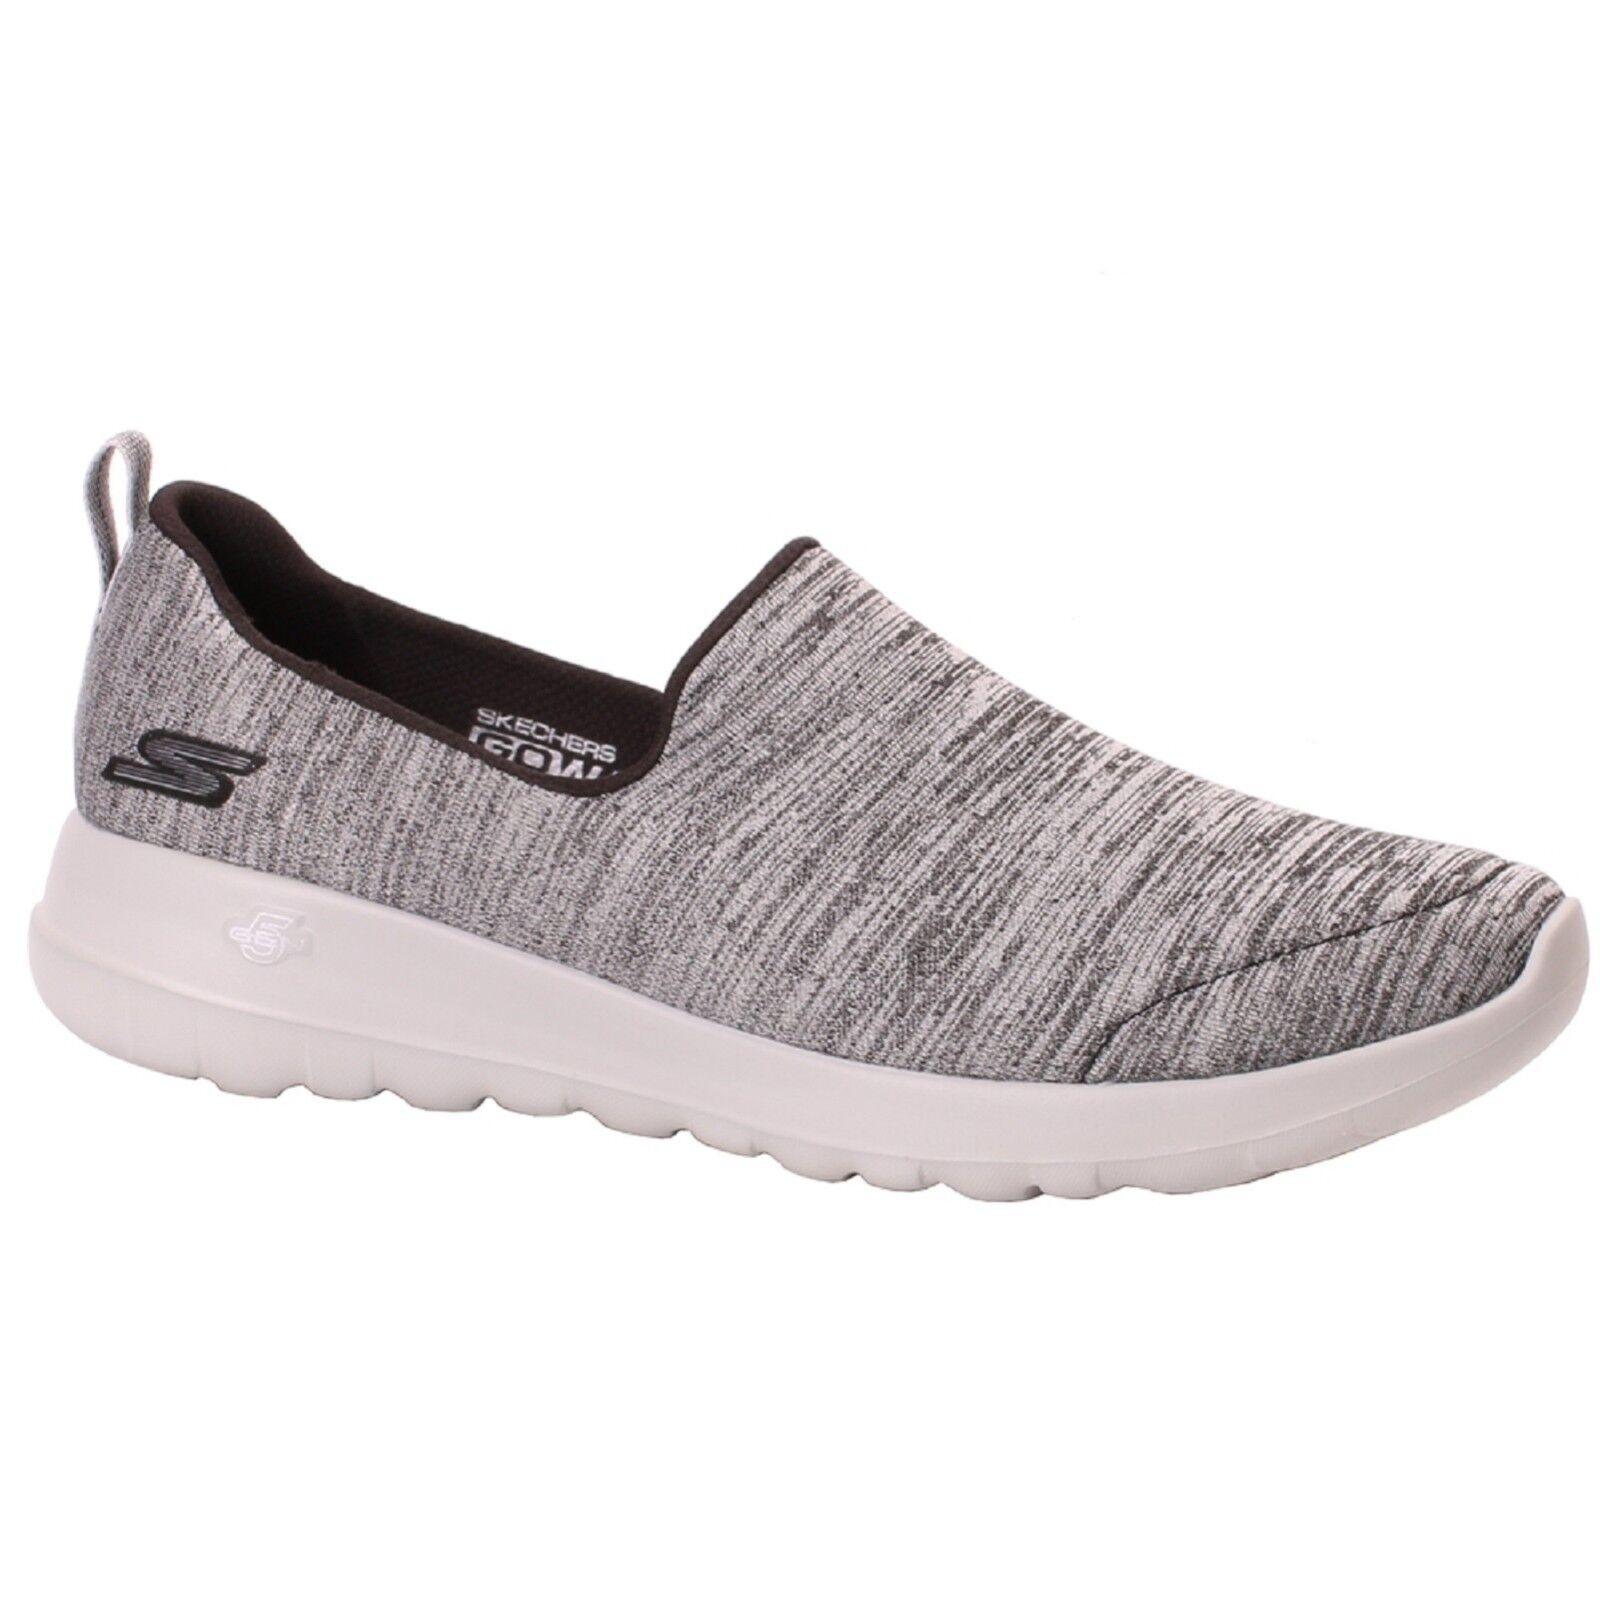 Women's Skechers GO WALK JOY 15611 Black Black Black Grey Slip-On Athletic Walking shoes ec5e5c